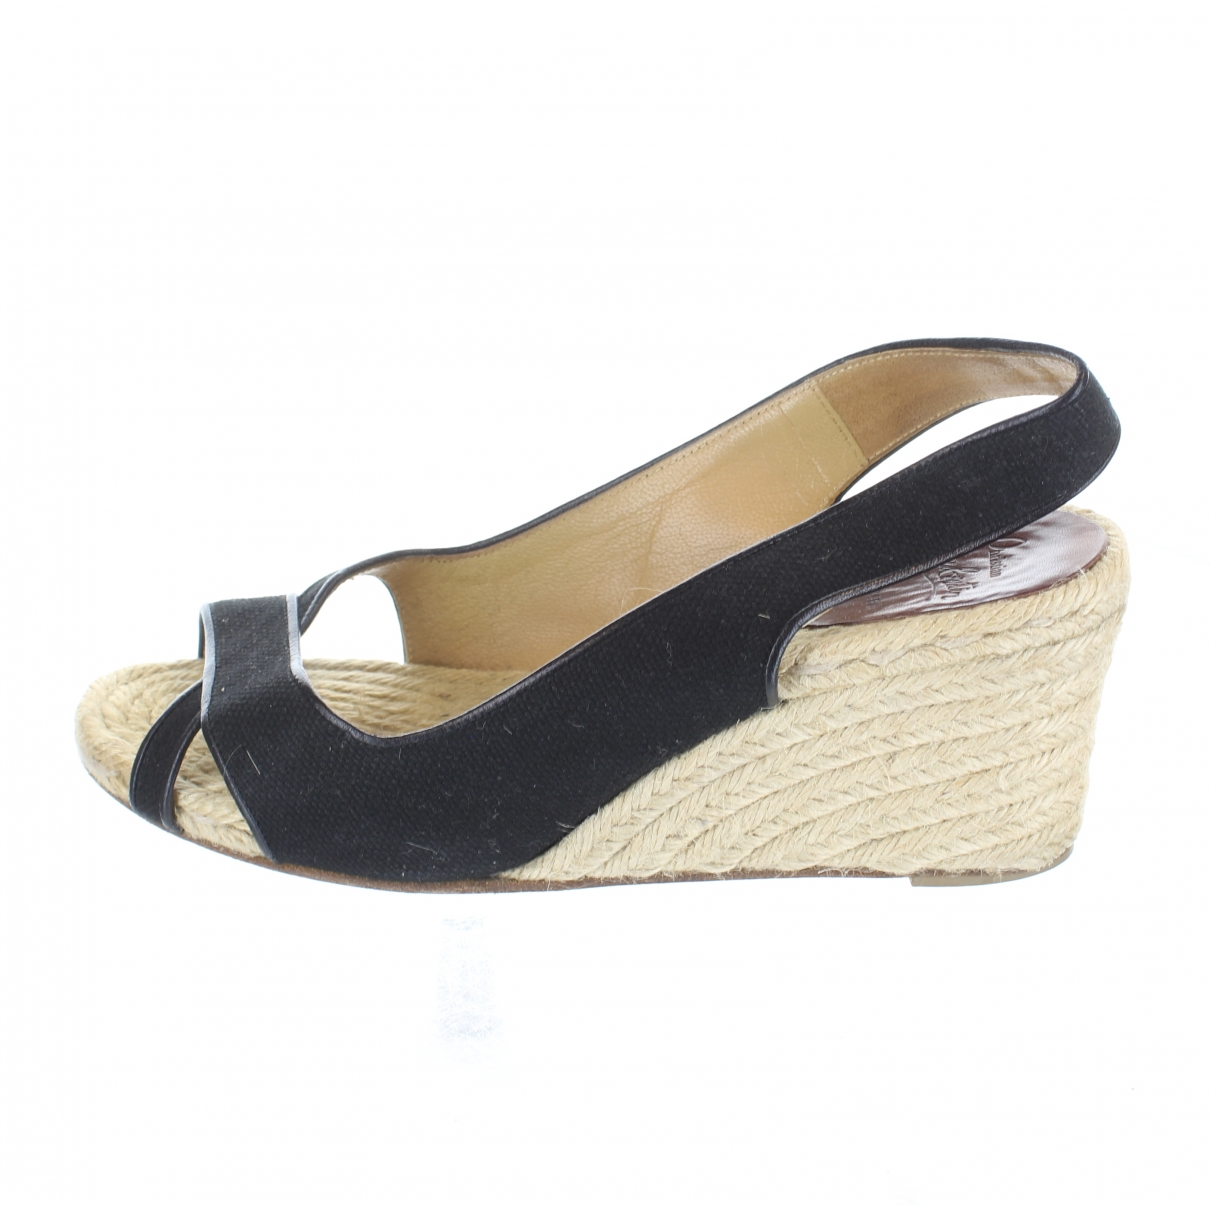 Christian Louboutin \N Black Suede Sandals for Women 39 EU